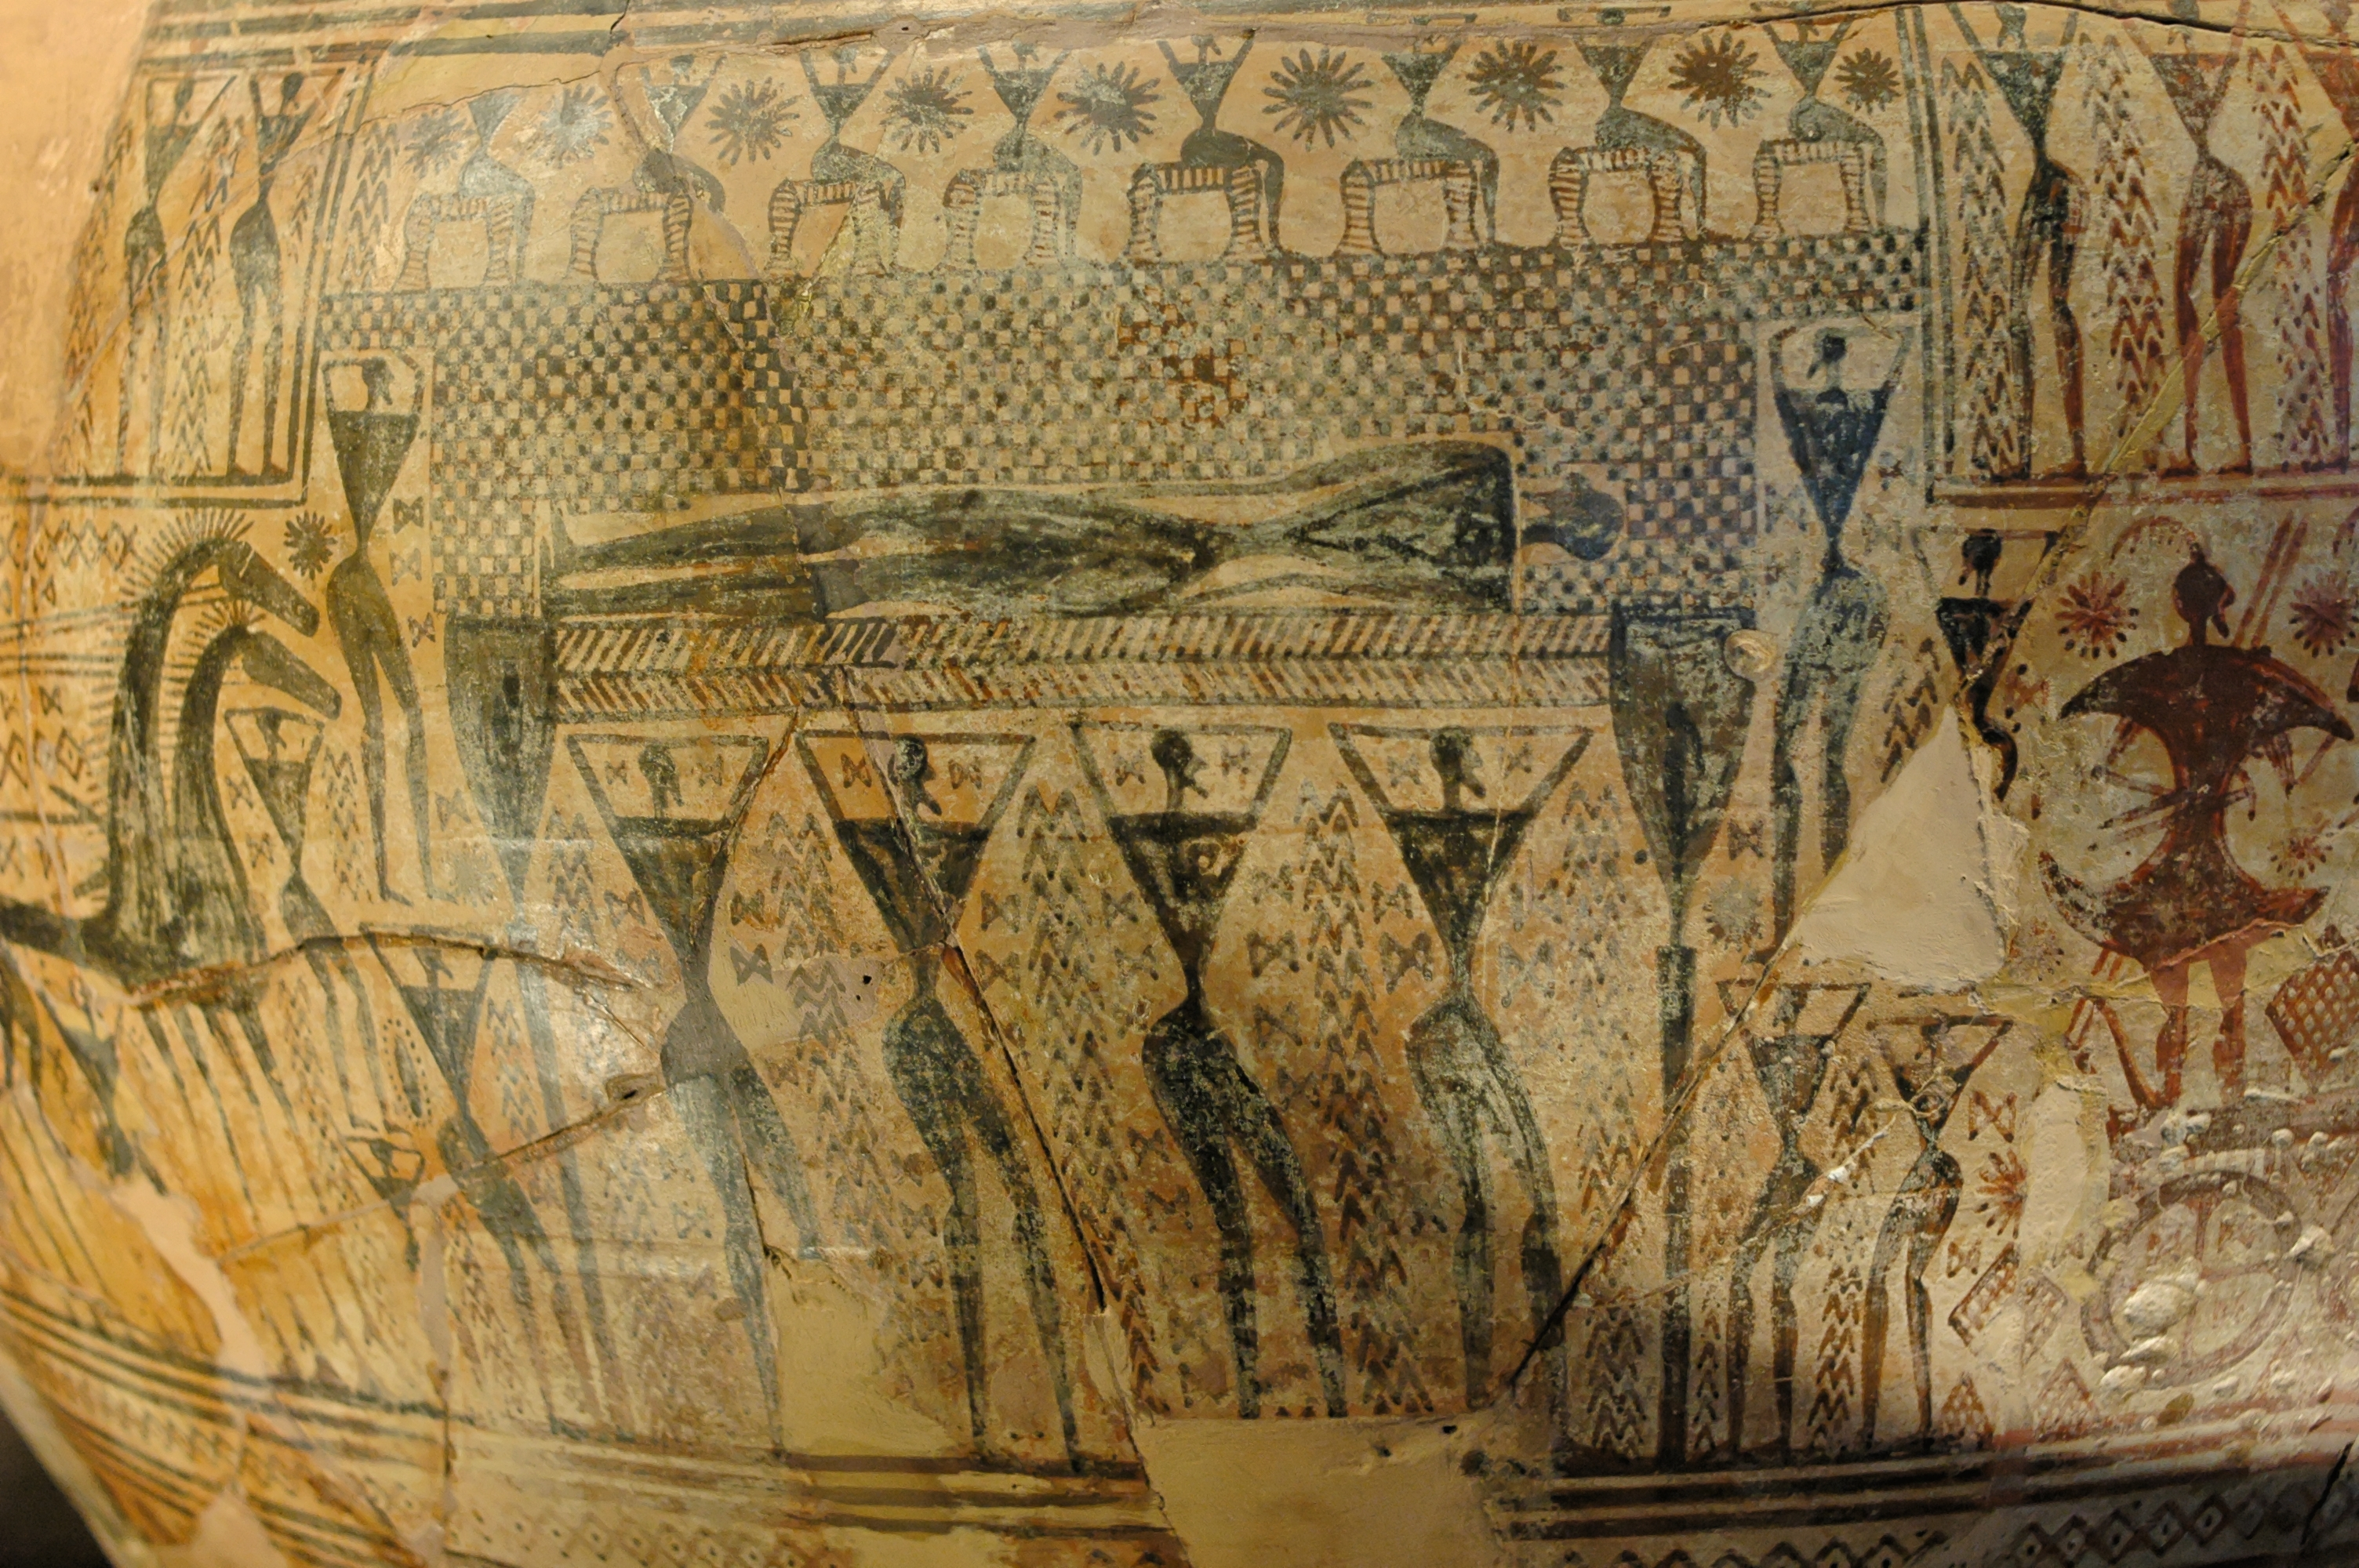 prothesis and ekphora in greek geometric art Prothesis and exphora in greek geometric art download prothesis and exphora in greek geometric art or read prothesis and ekphora in greek geometric art author.